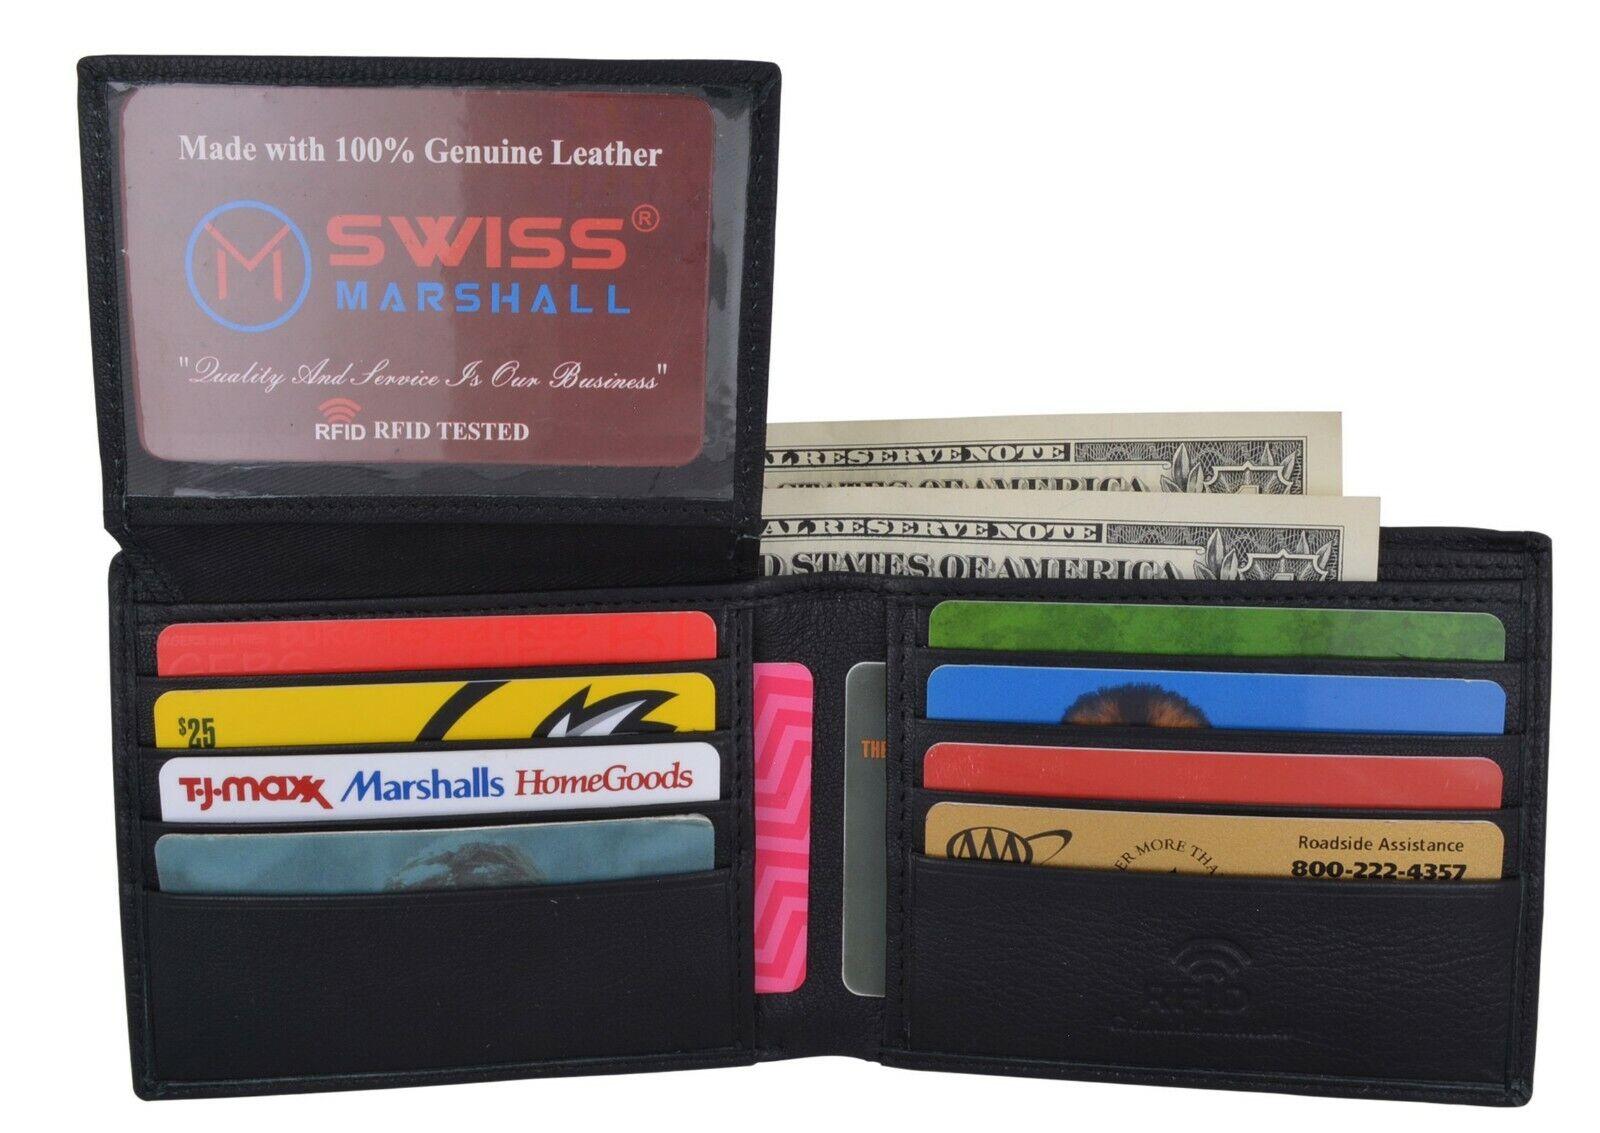 RFID Blocking Brown Handcrafted Cowhide Leather Men's Bifold Premium Wallet